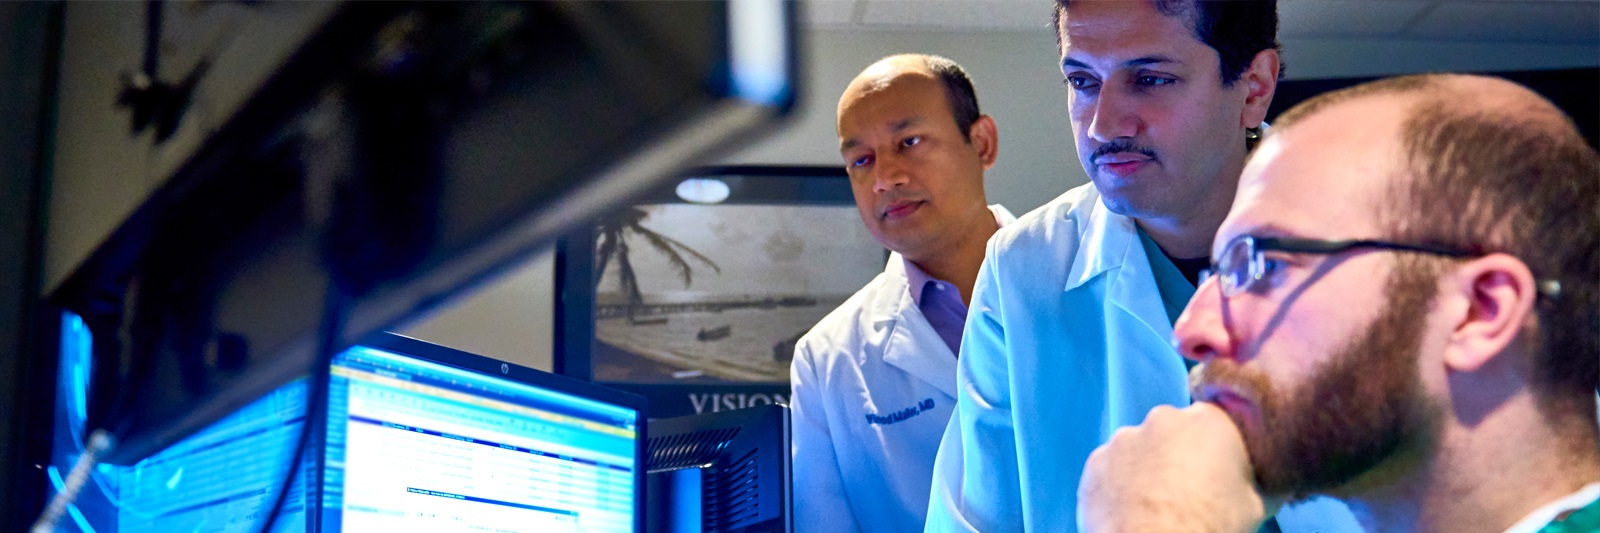 Vascular and Interventional Radiology Fellowship